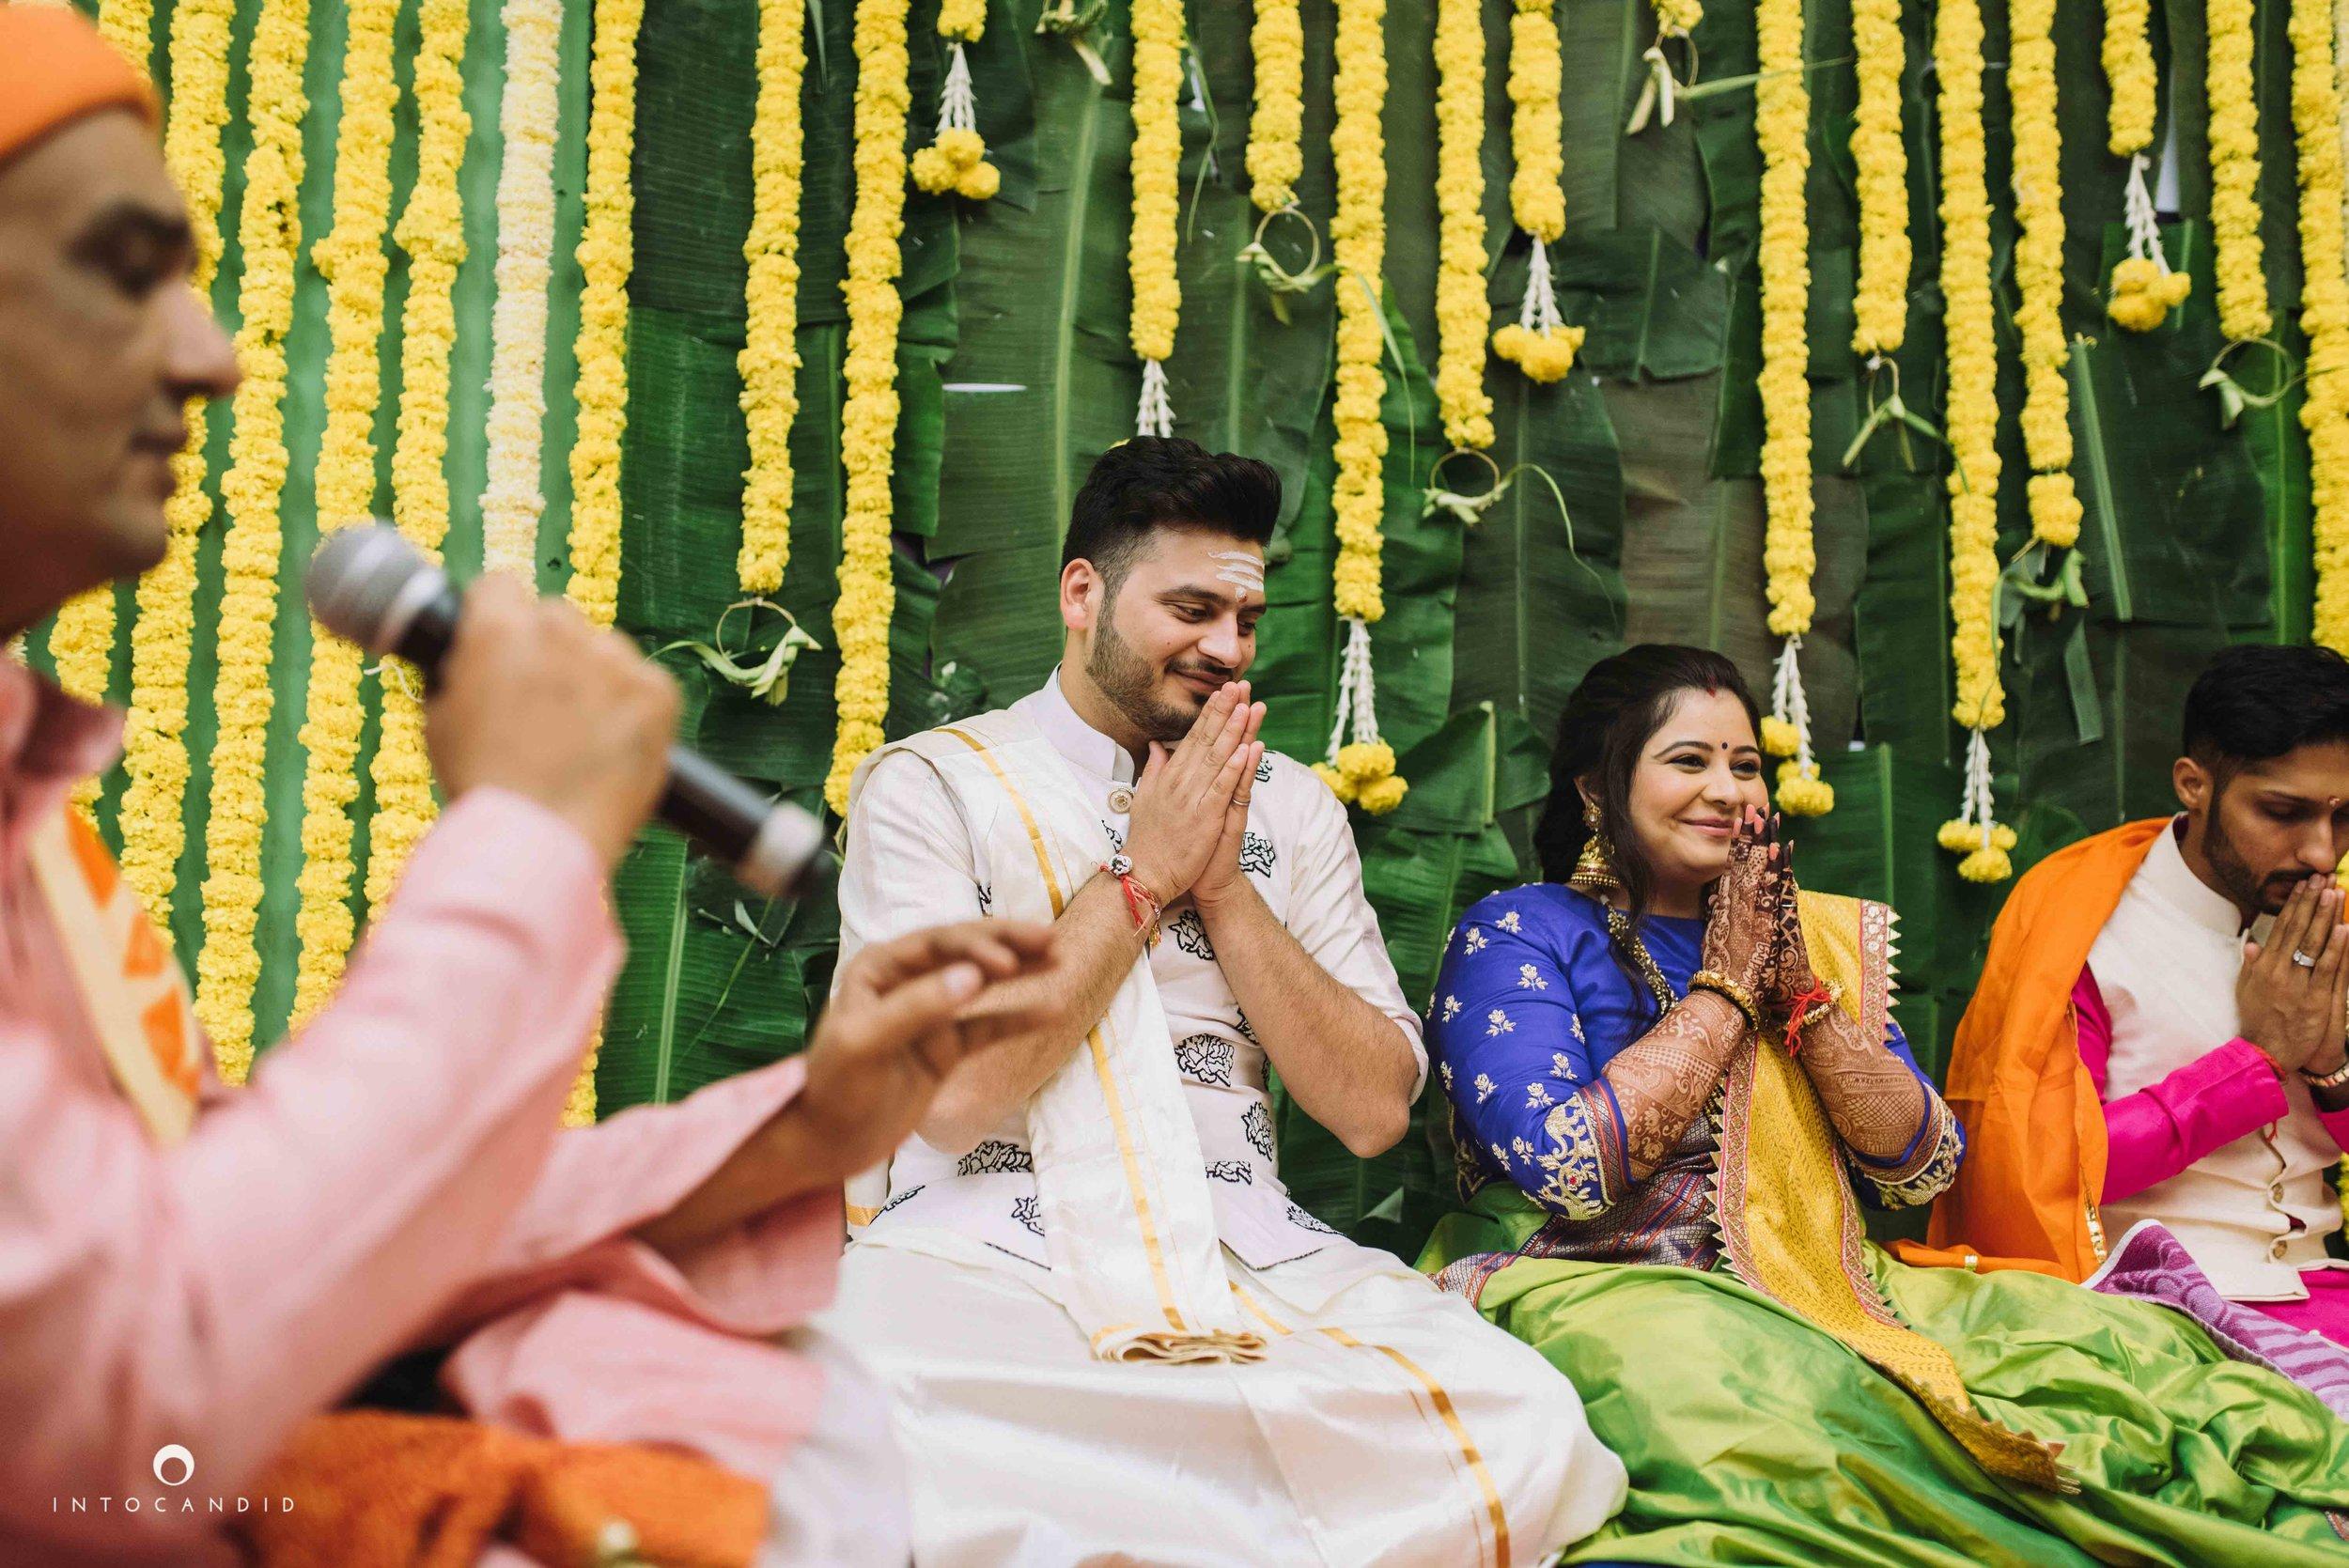 Goa_Wedding_Photographer_Zuri_whitesands_015.jpg